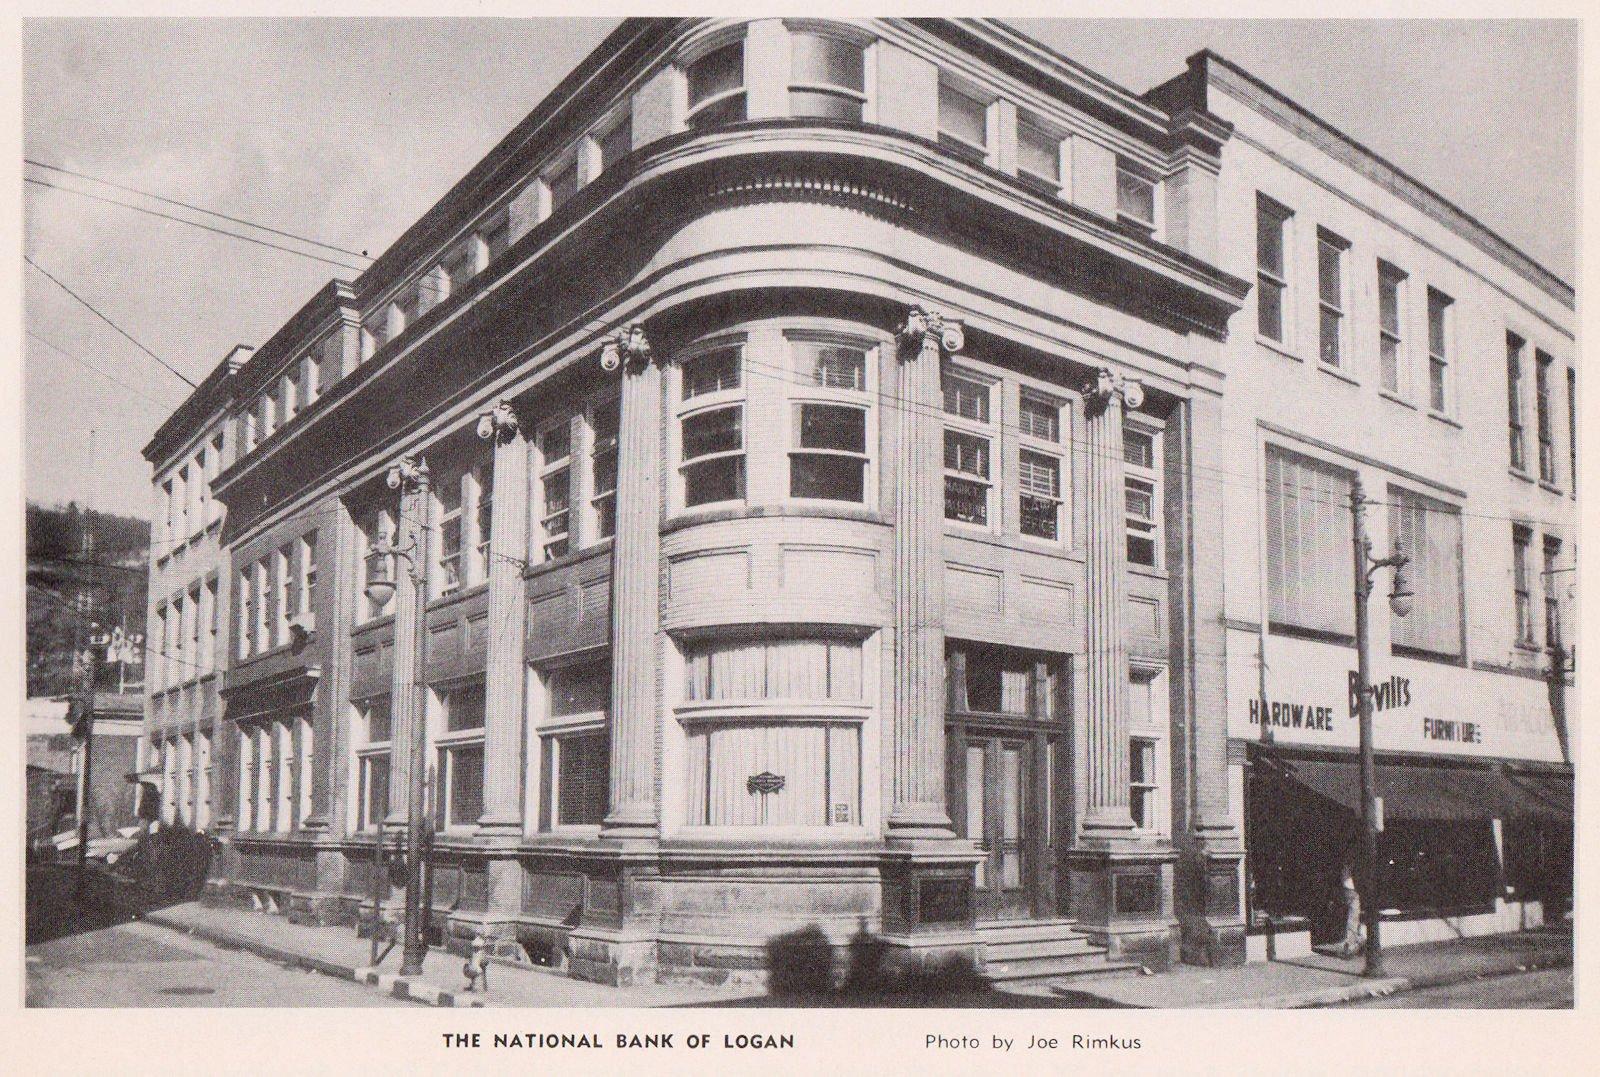 1952, The National Bank of Logan